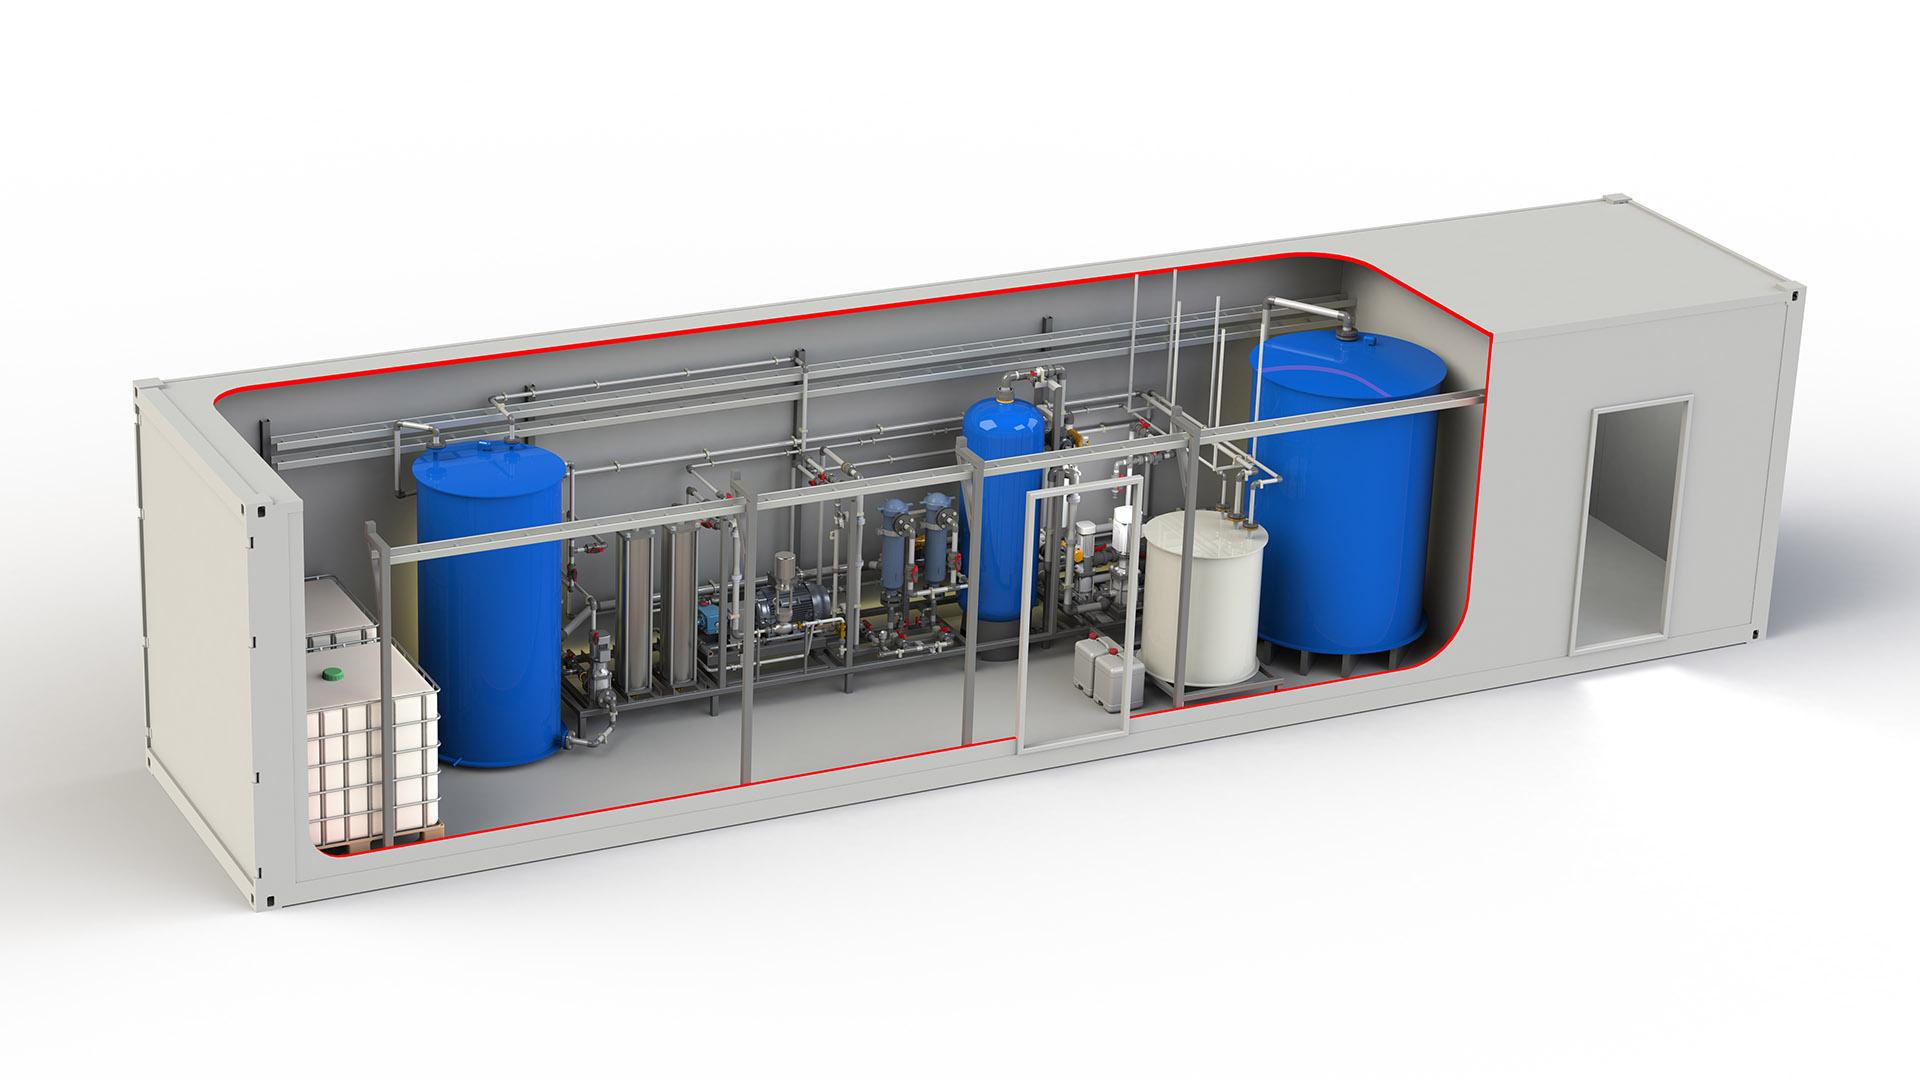 Teollisuuden vesi Oy